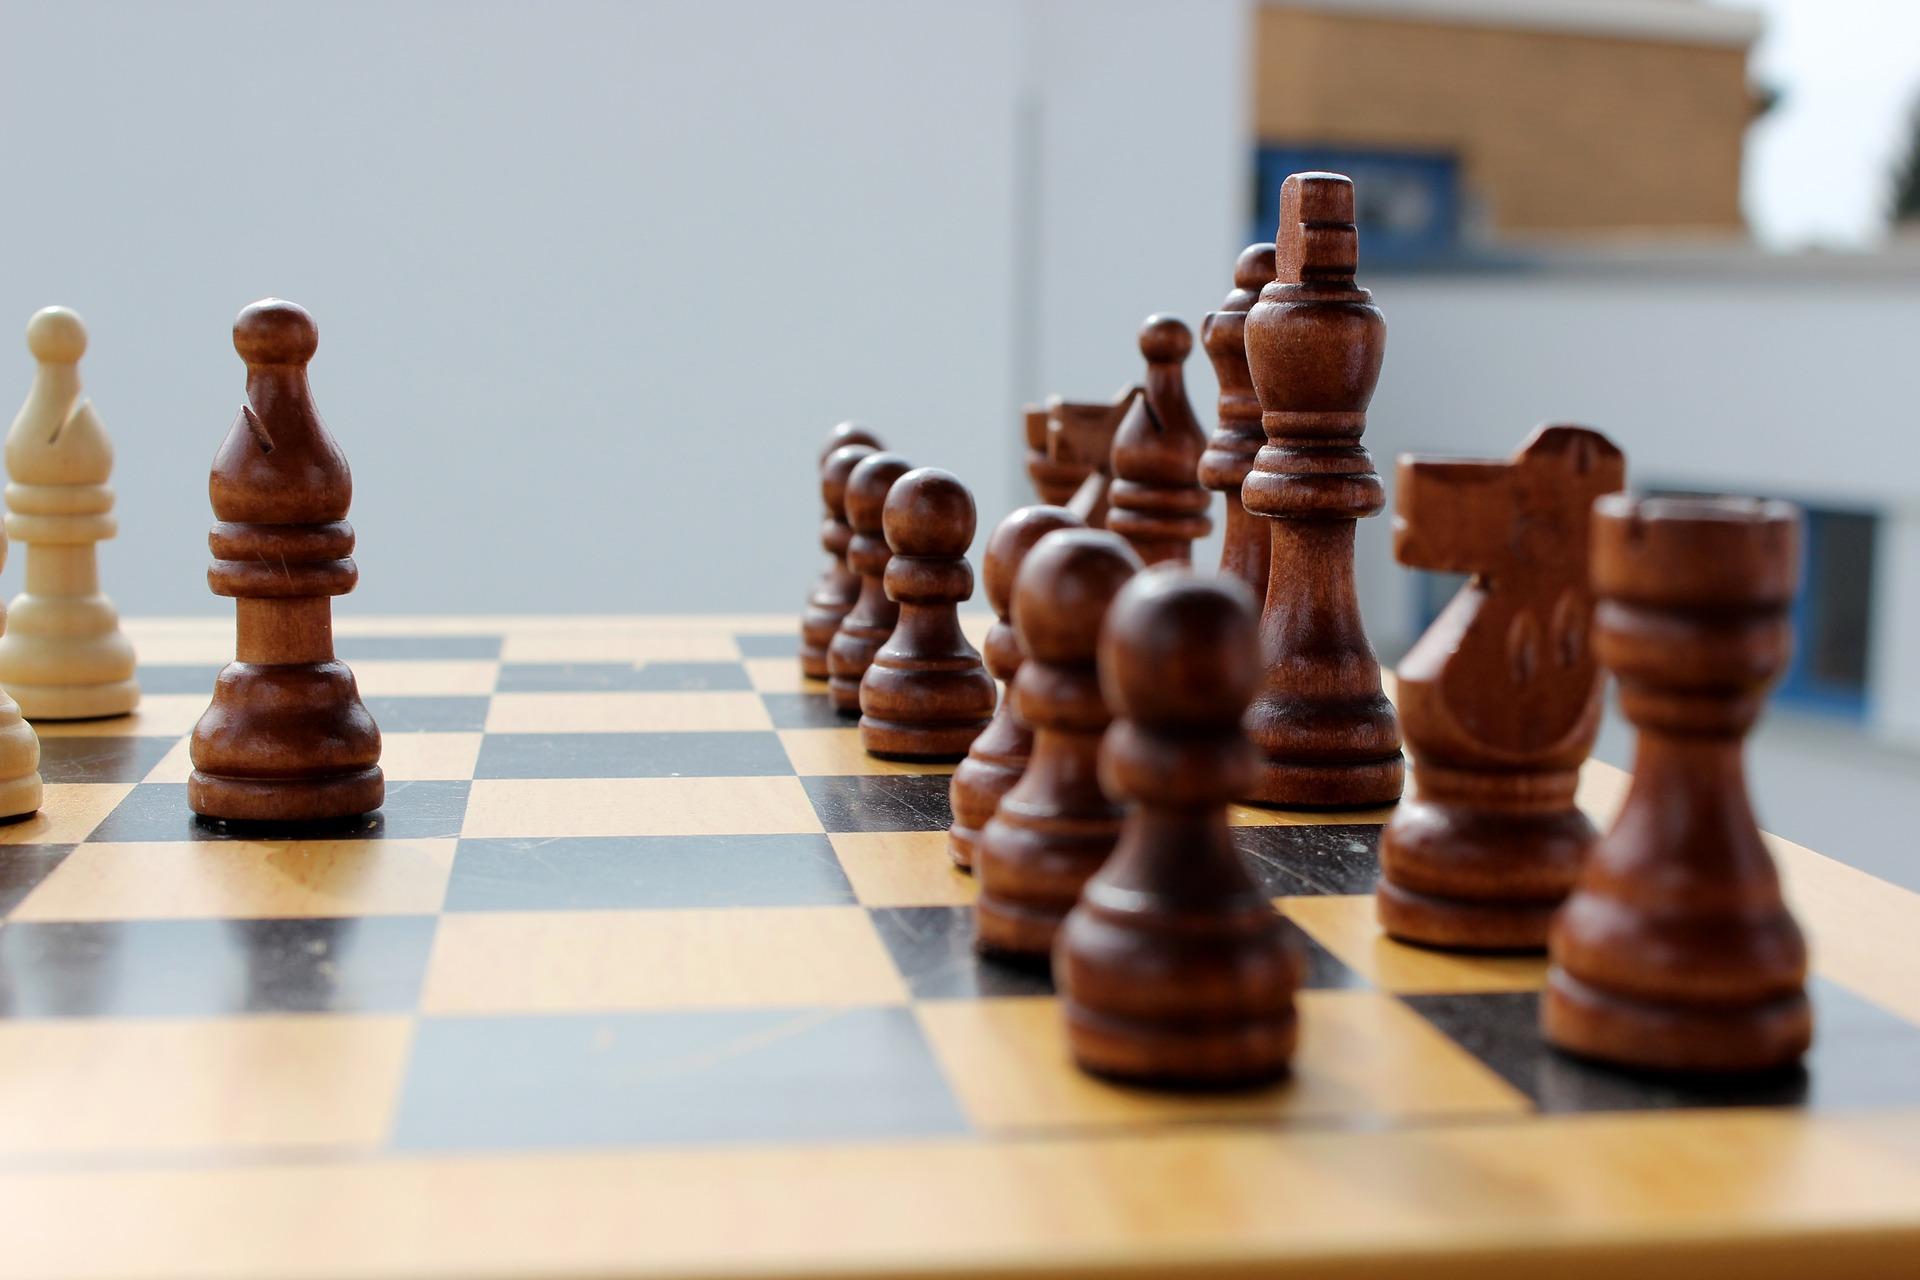 szachy gońce goniec debiut